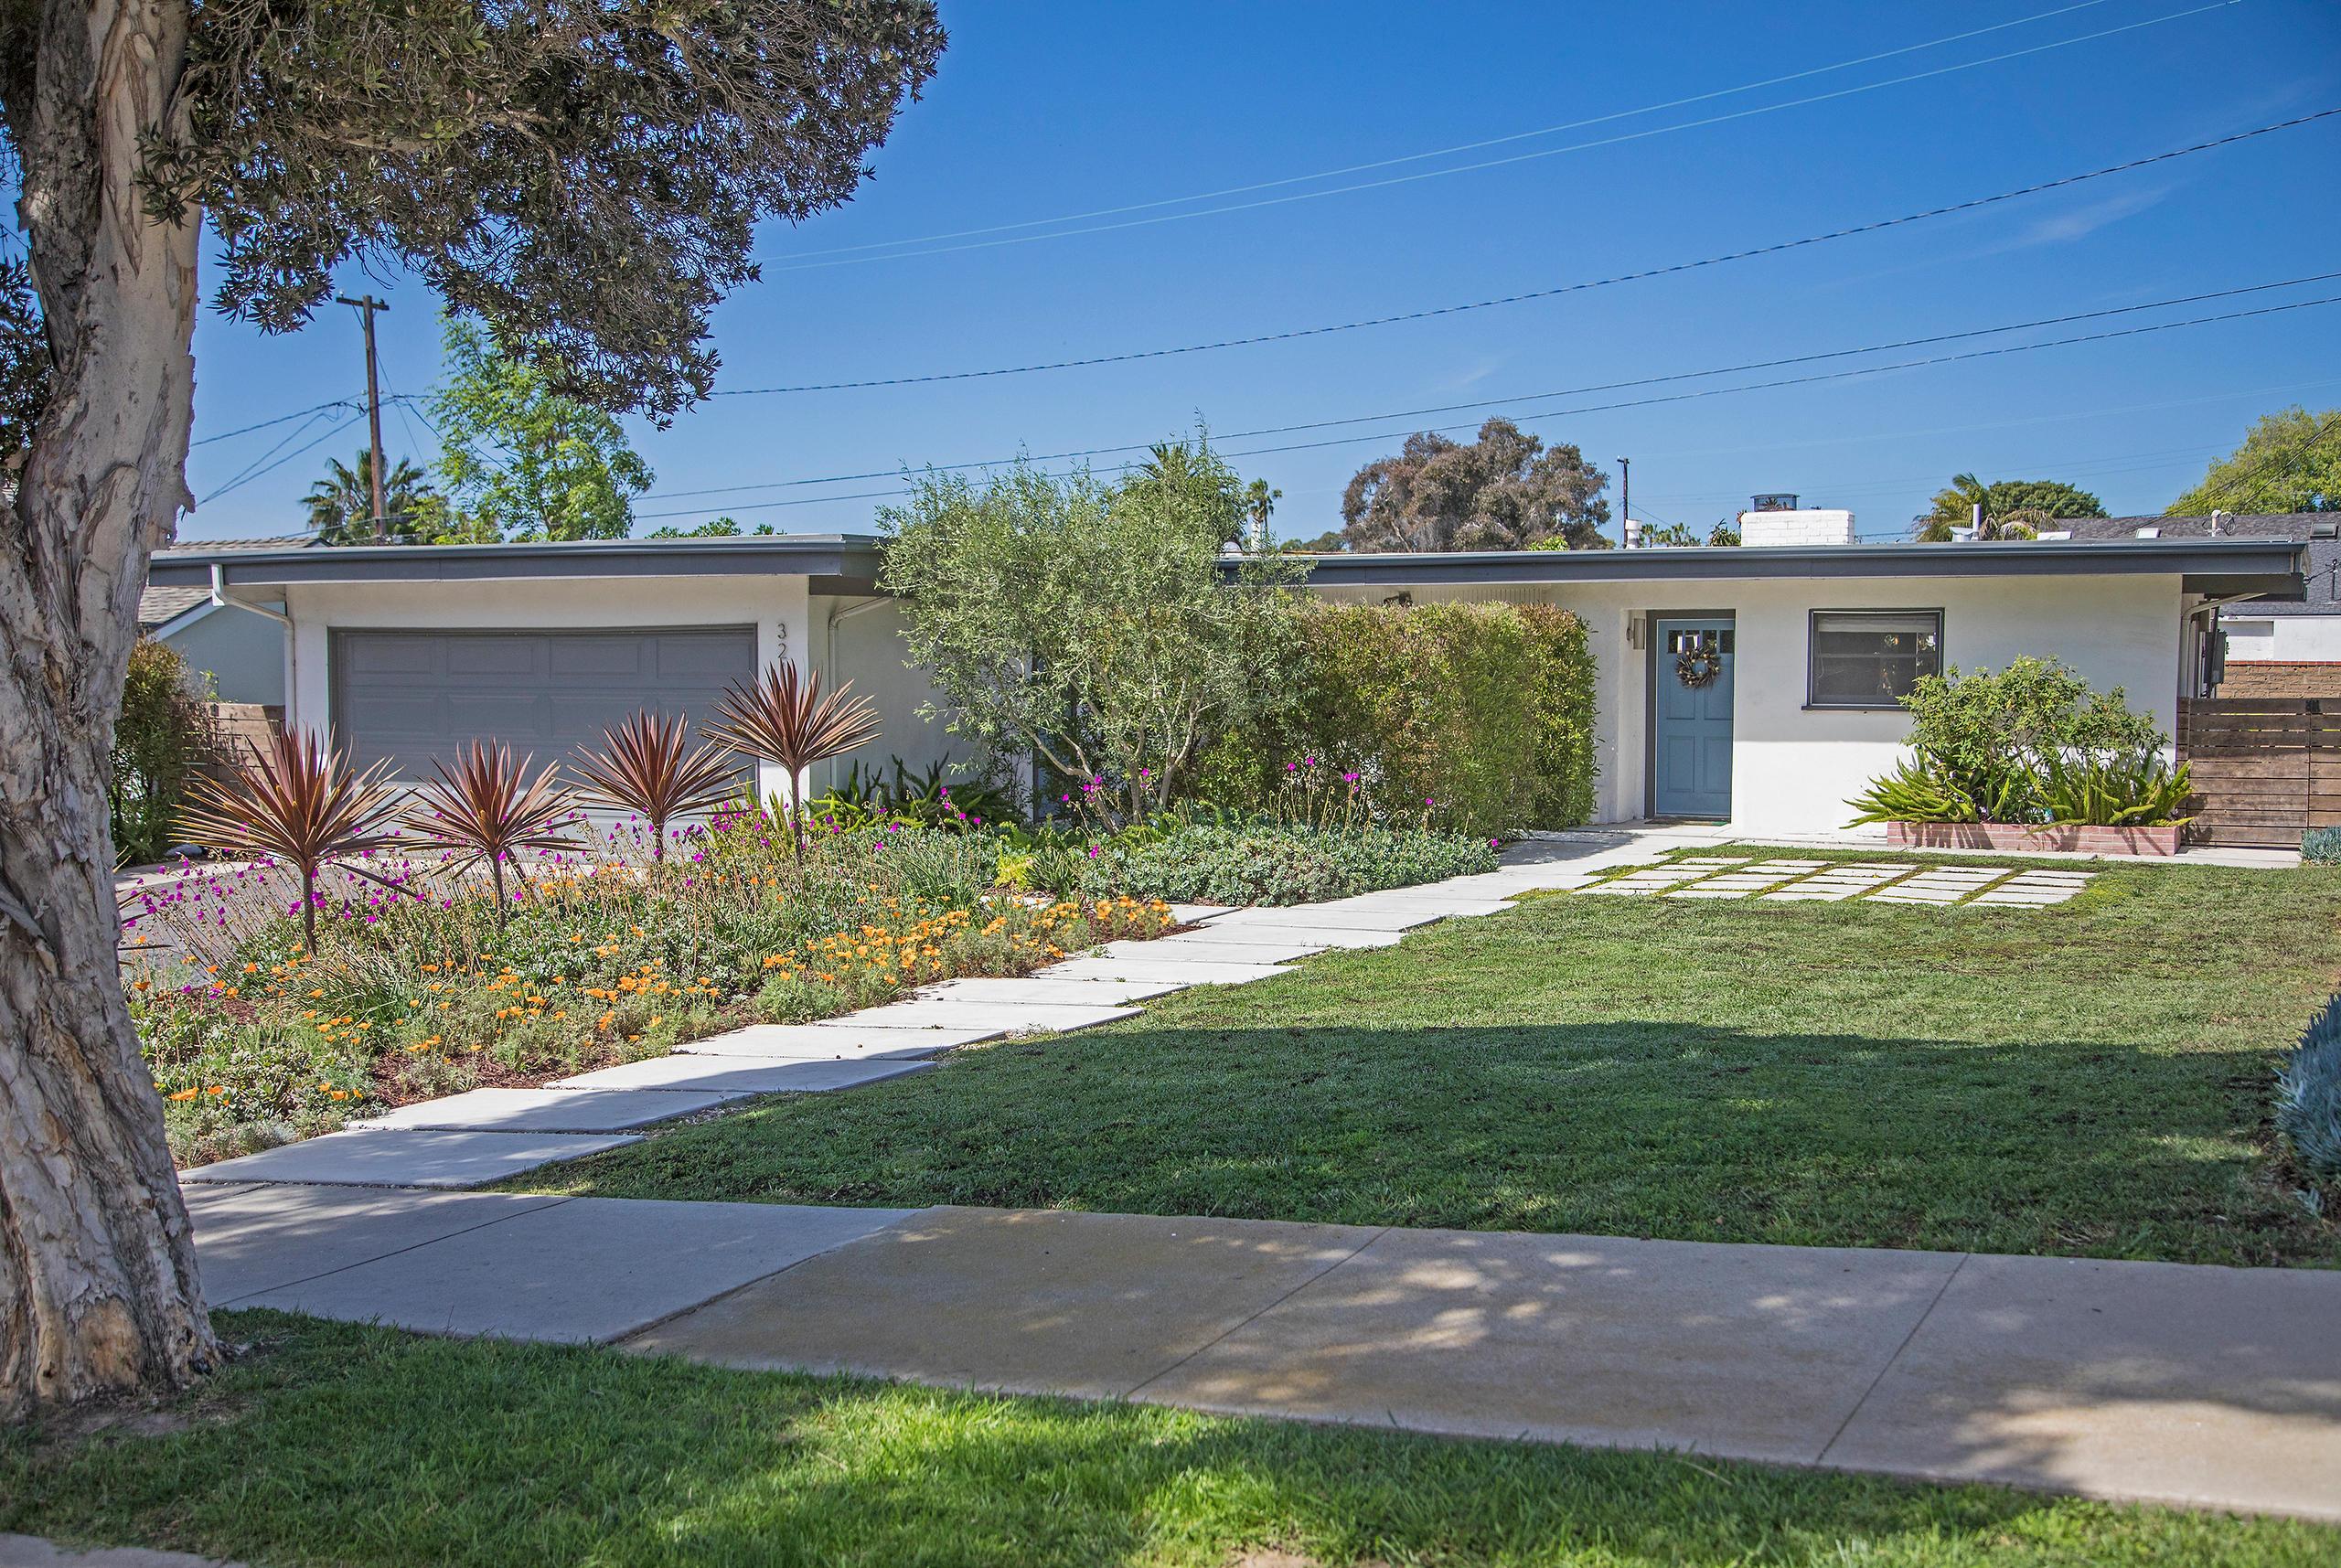 Property photo for 321 El Monte Dr Santa Barbara, California 93109 - 19-1282